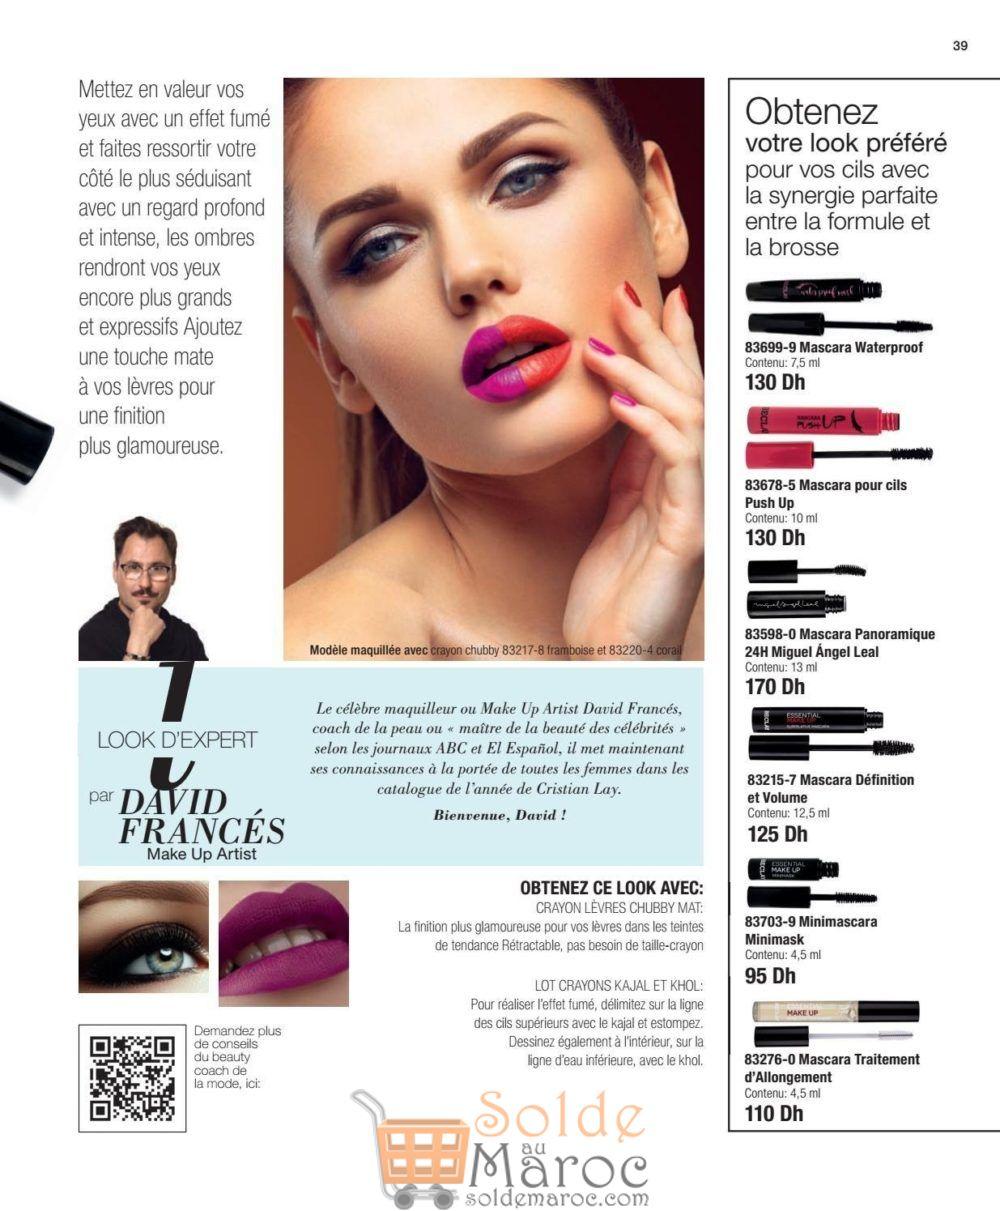 Catalogue Cristian Lay Maroc du 23 Juillet au 16 Août 2018